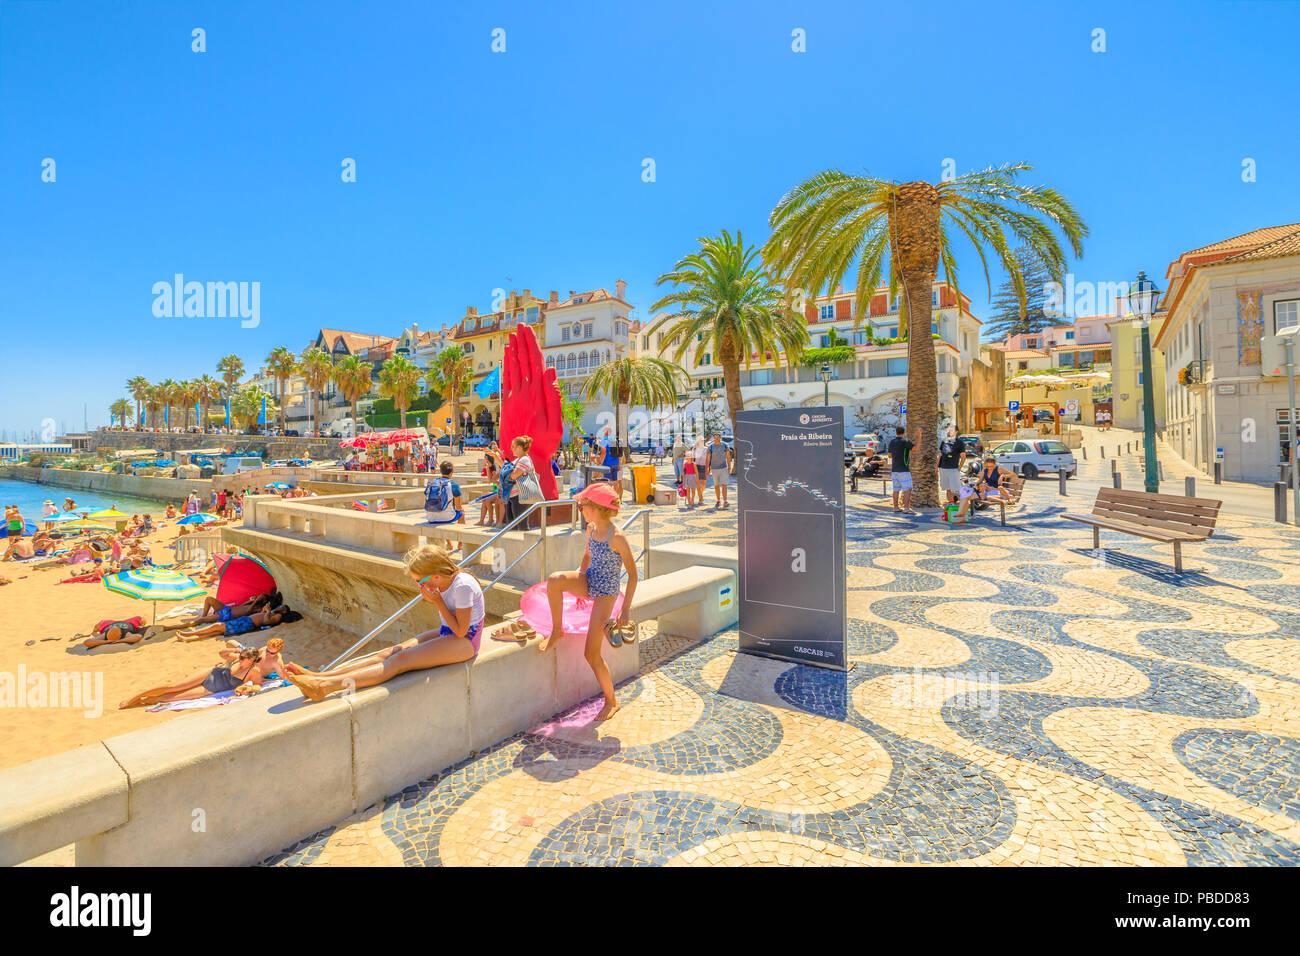 Cascais, Portugal - August 6, 2017: promenade along Ribeira beach on Passeio Dom Luis I street. Cascais is popular summer vacation spot in Lisbon Coas - Stock Image